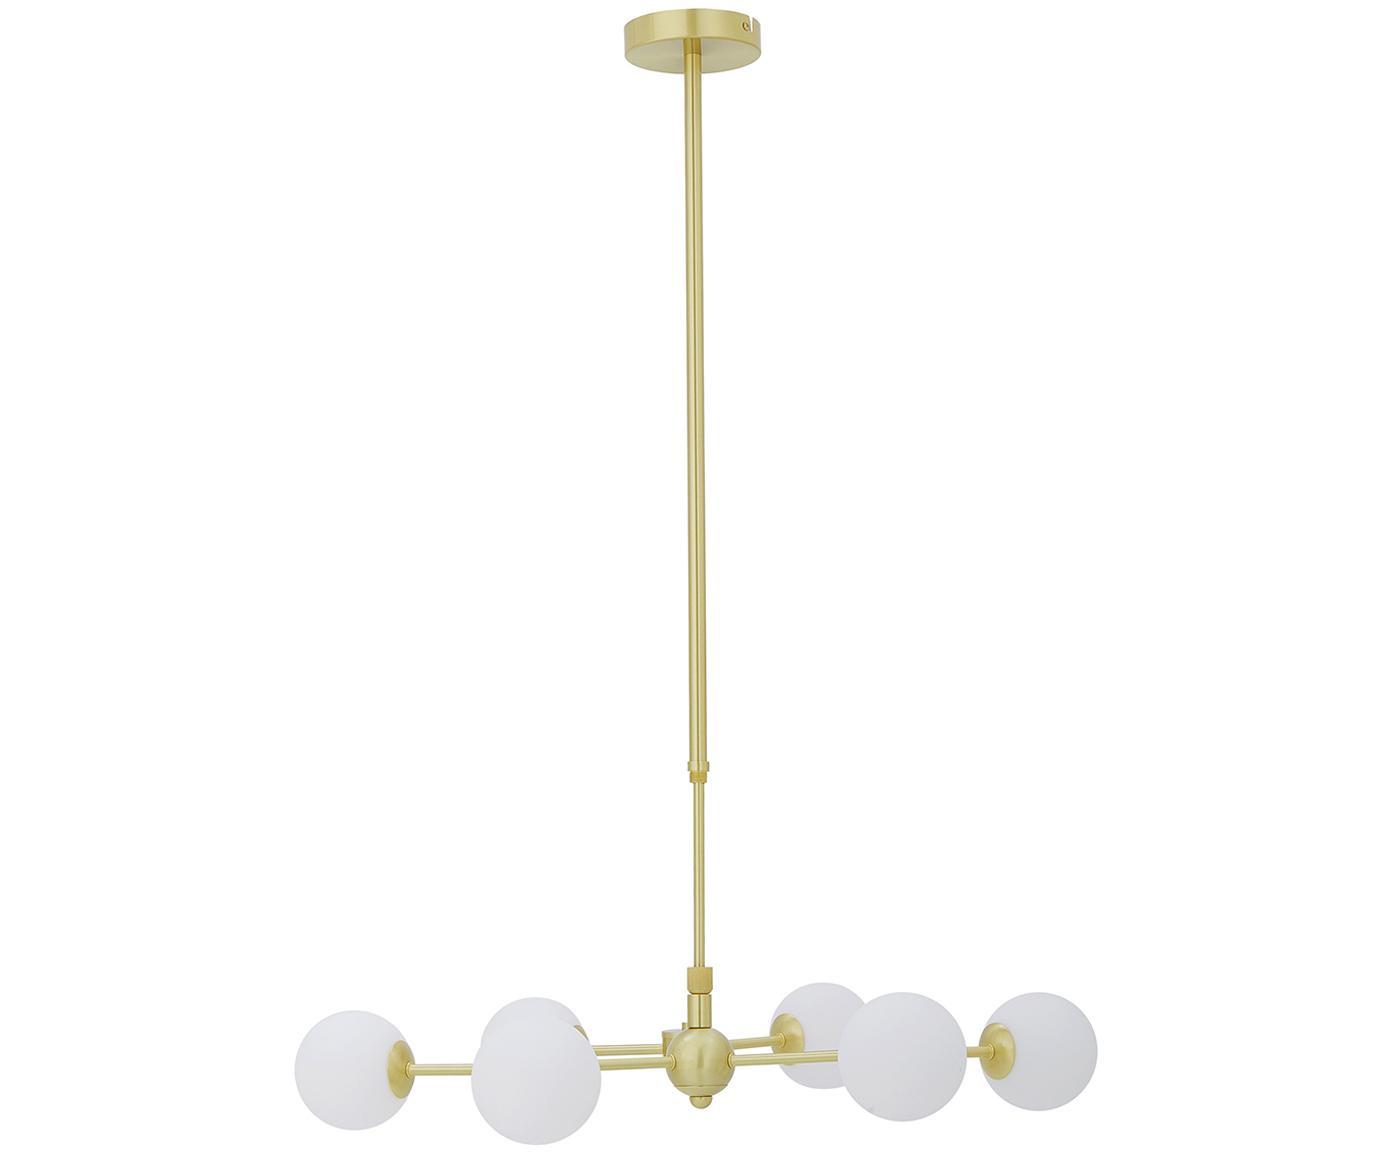 Grote hanglamp Aurelia goudkleurig, Wit, messingkleurig, B 110 x D 55 cm